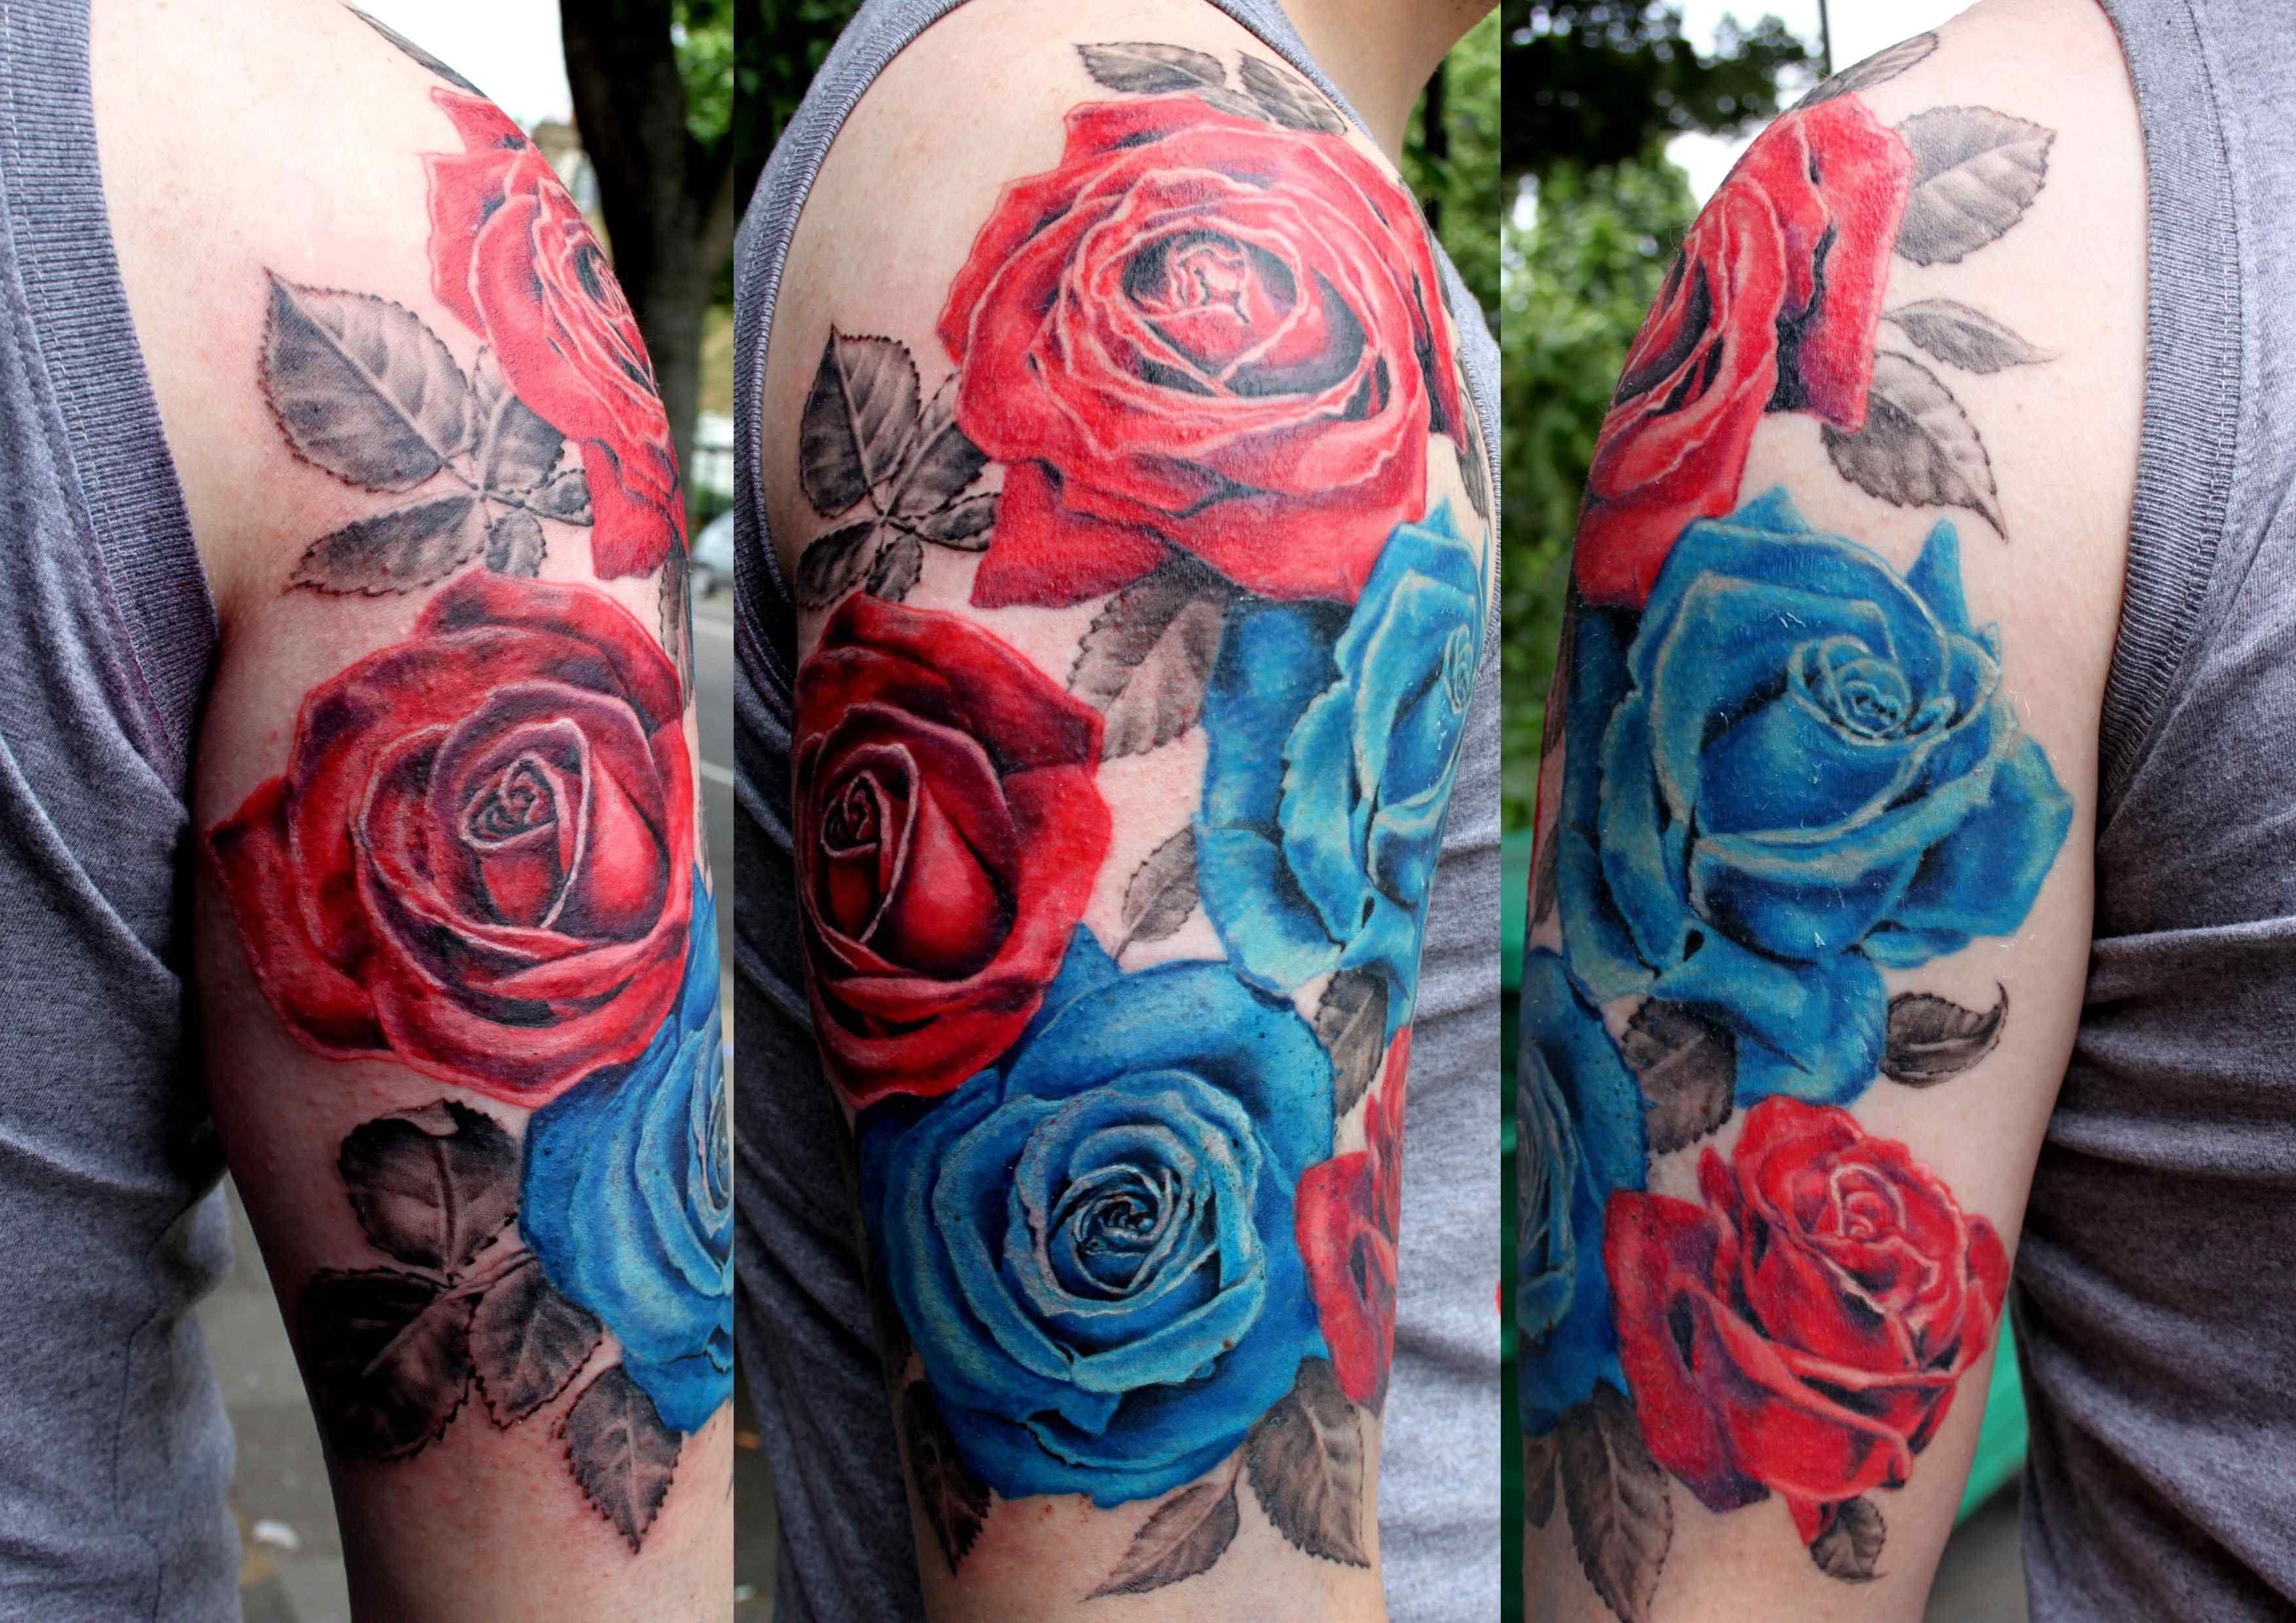 Creative Rose Tattoos For Men Half Sleeve Half Sleeve Tattoos Roses Blue Rose Tattoos Half Sleeve Rose Tattoo Rose Tattoos For Men